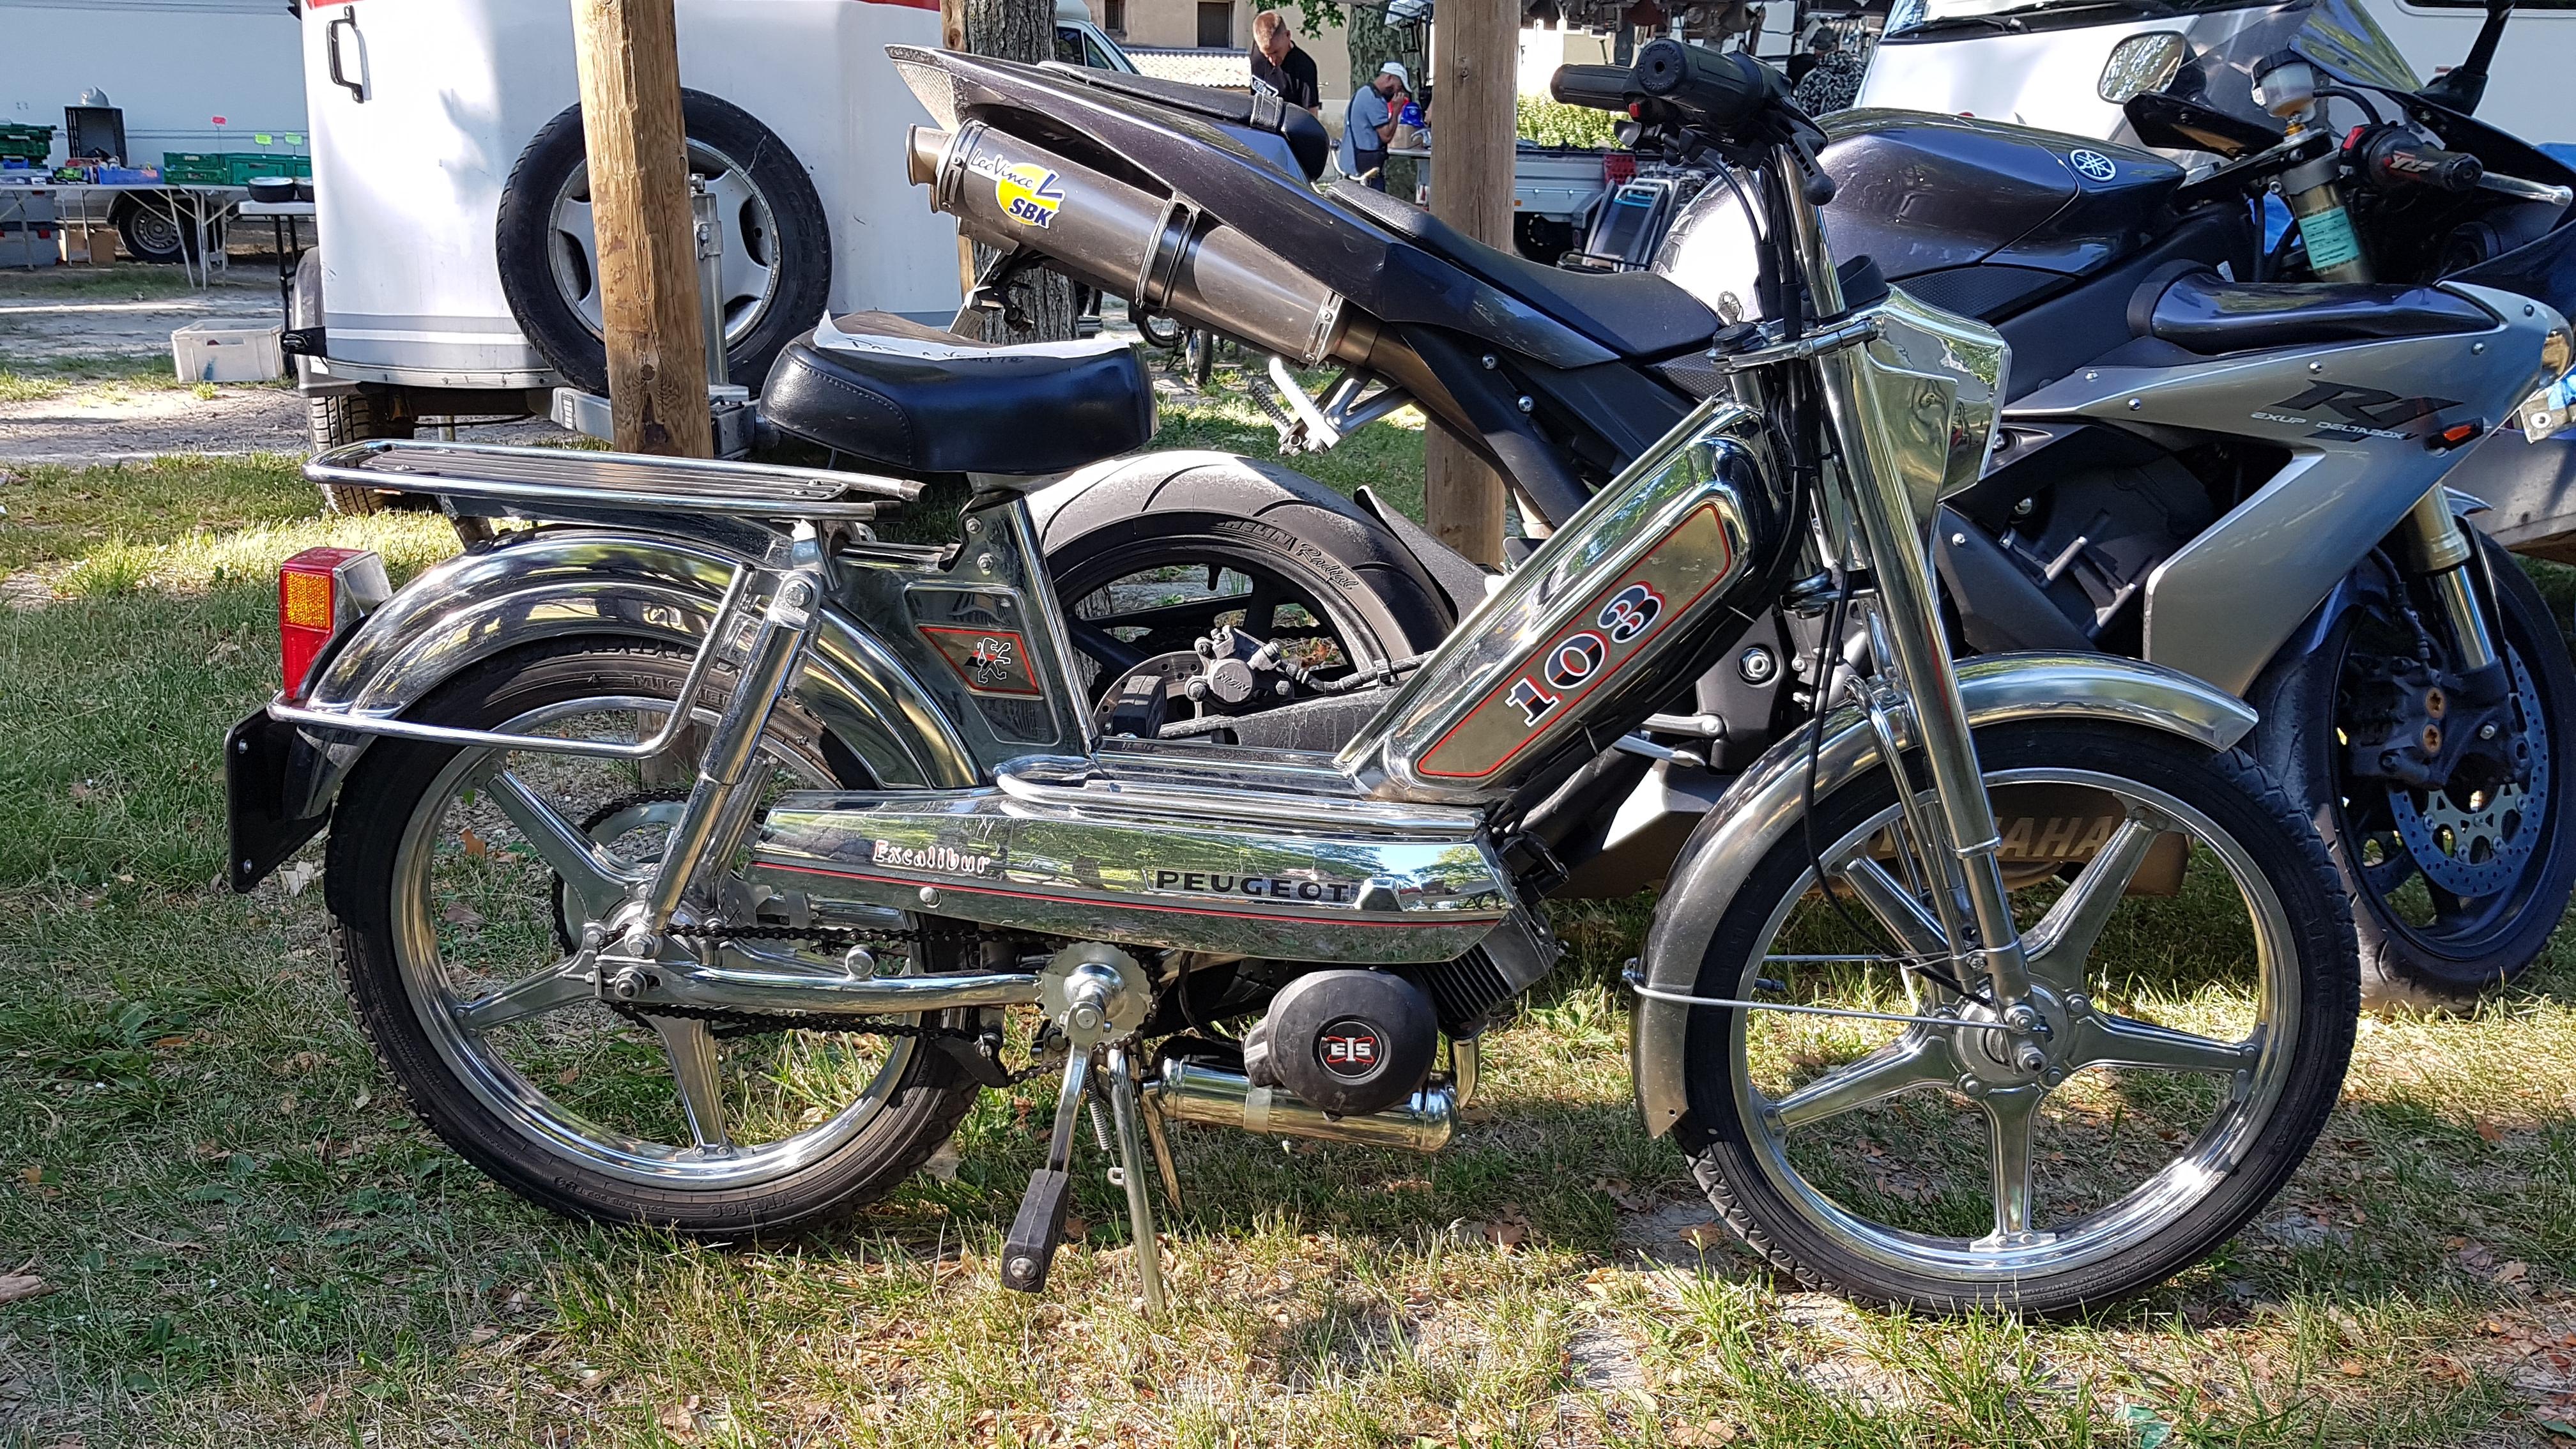 D/écompresseur complet soupape ressort cyclo mobylette Peugeot 103 MVL Neuf mob